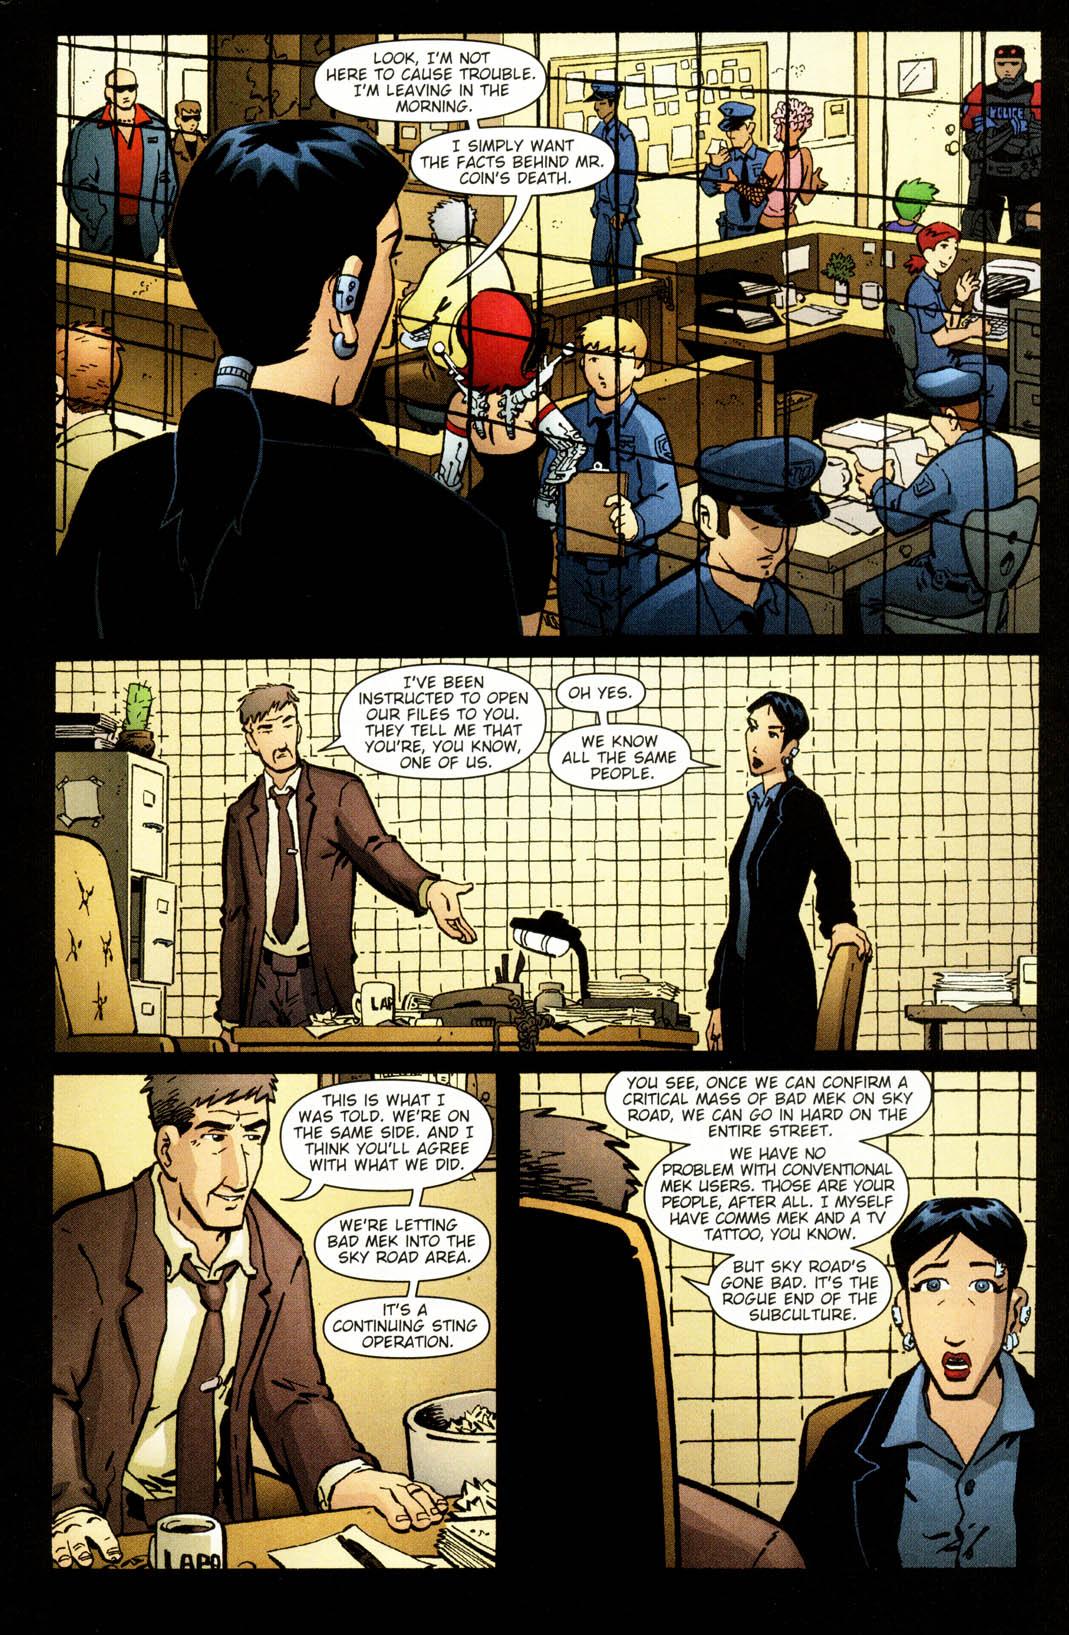 Read online Mek comic -  Issue #2 - 23